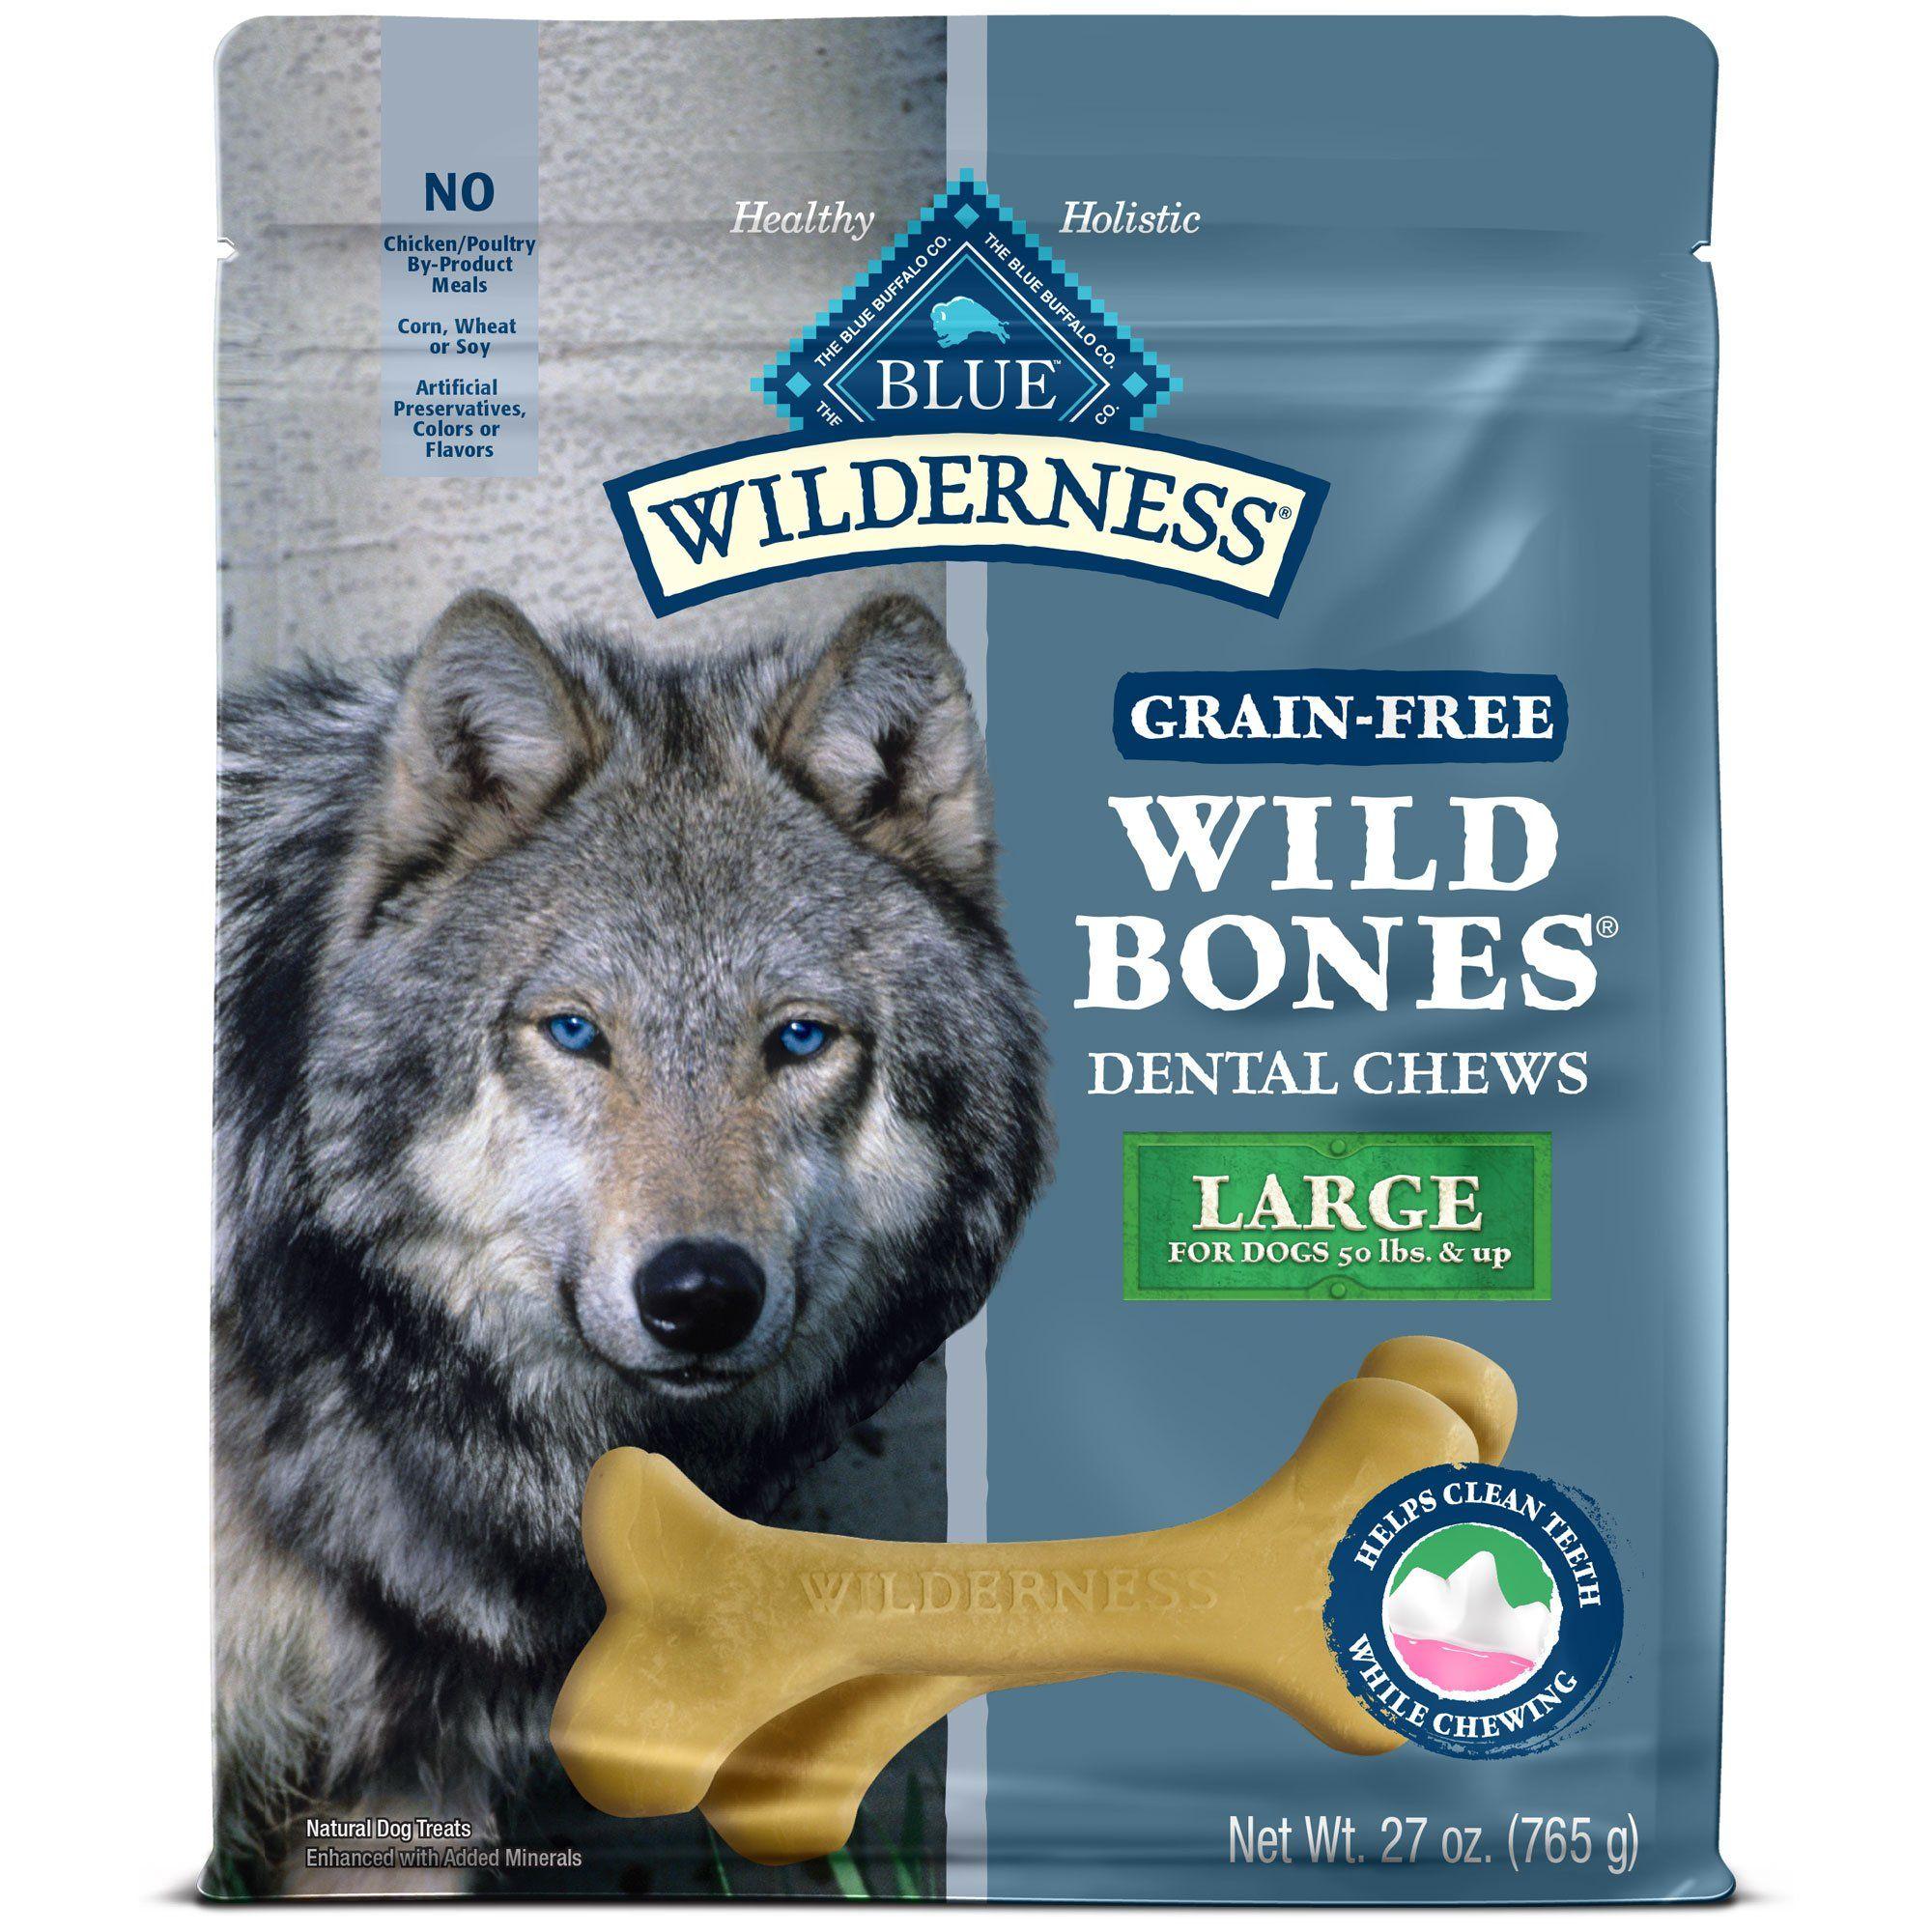 Blue Buffalo Wild Bones Dog Chew Large 27 Oz Dog Treats Grain